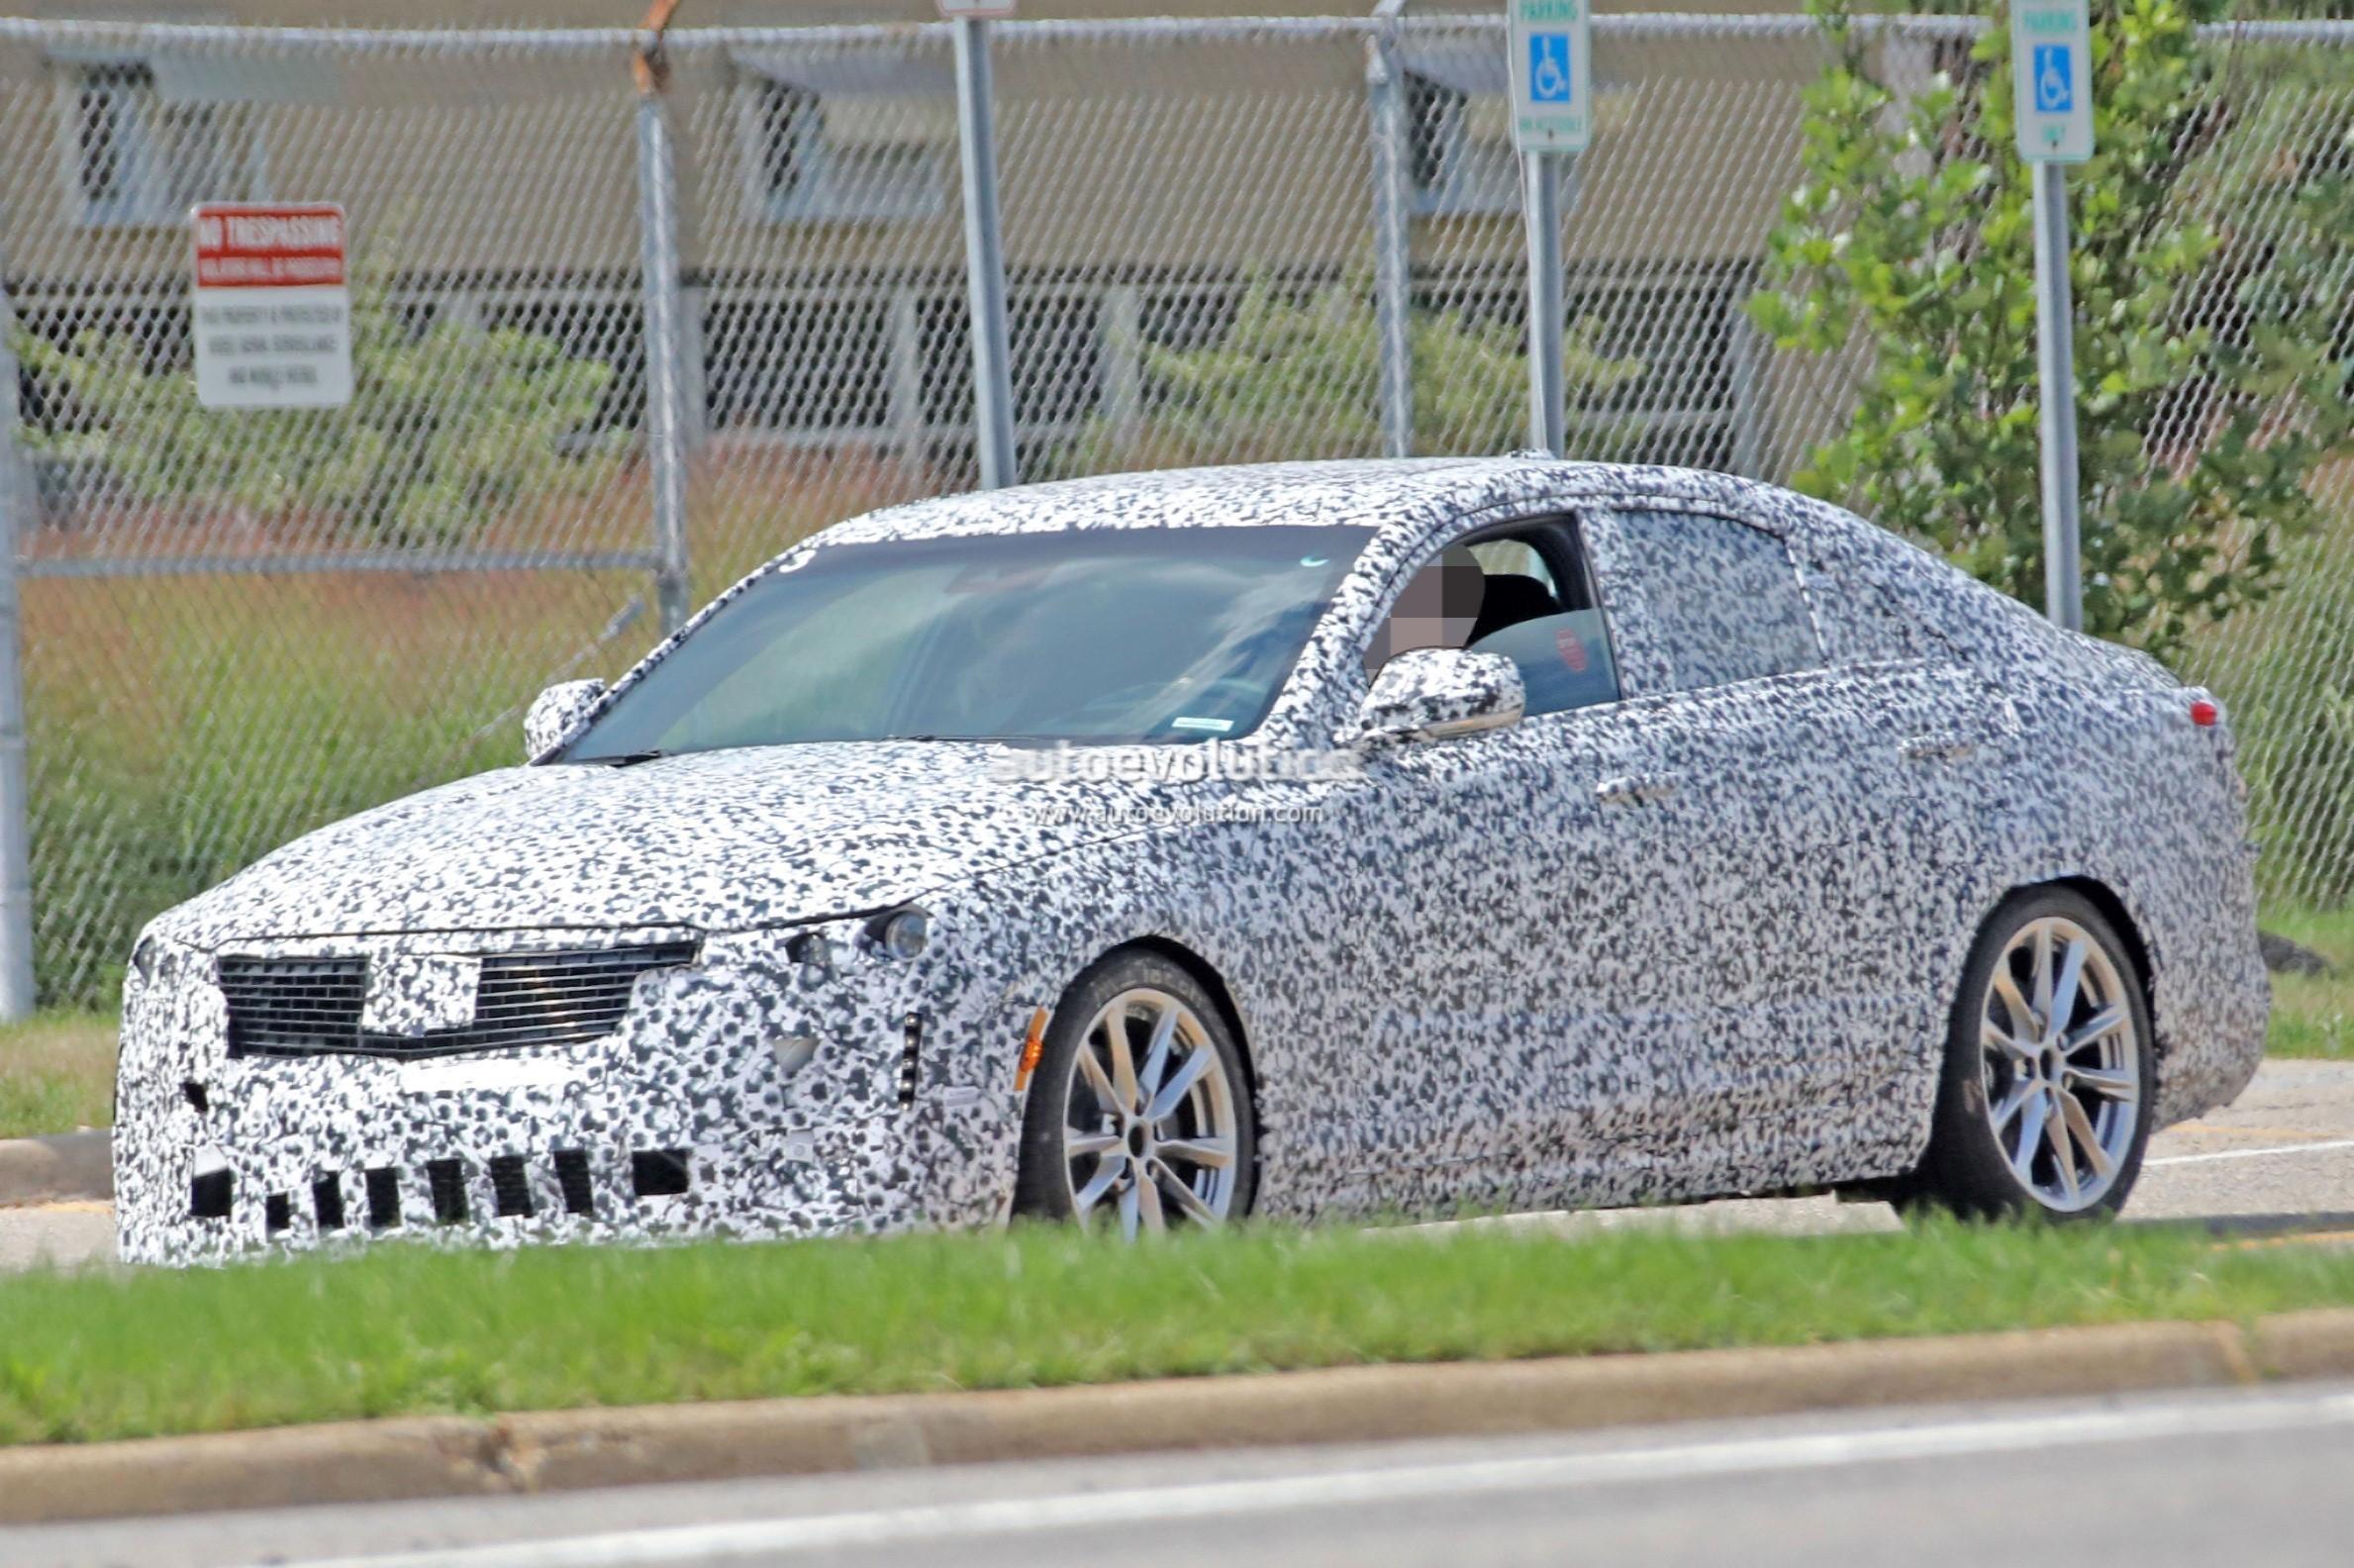 2020 Cadillac CT4 Small RWD Sedan Spied Flaunting Quad ...